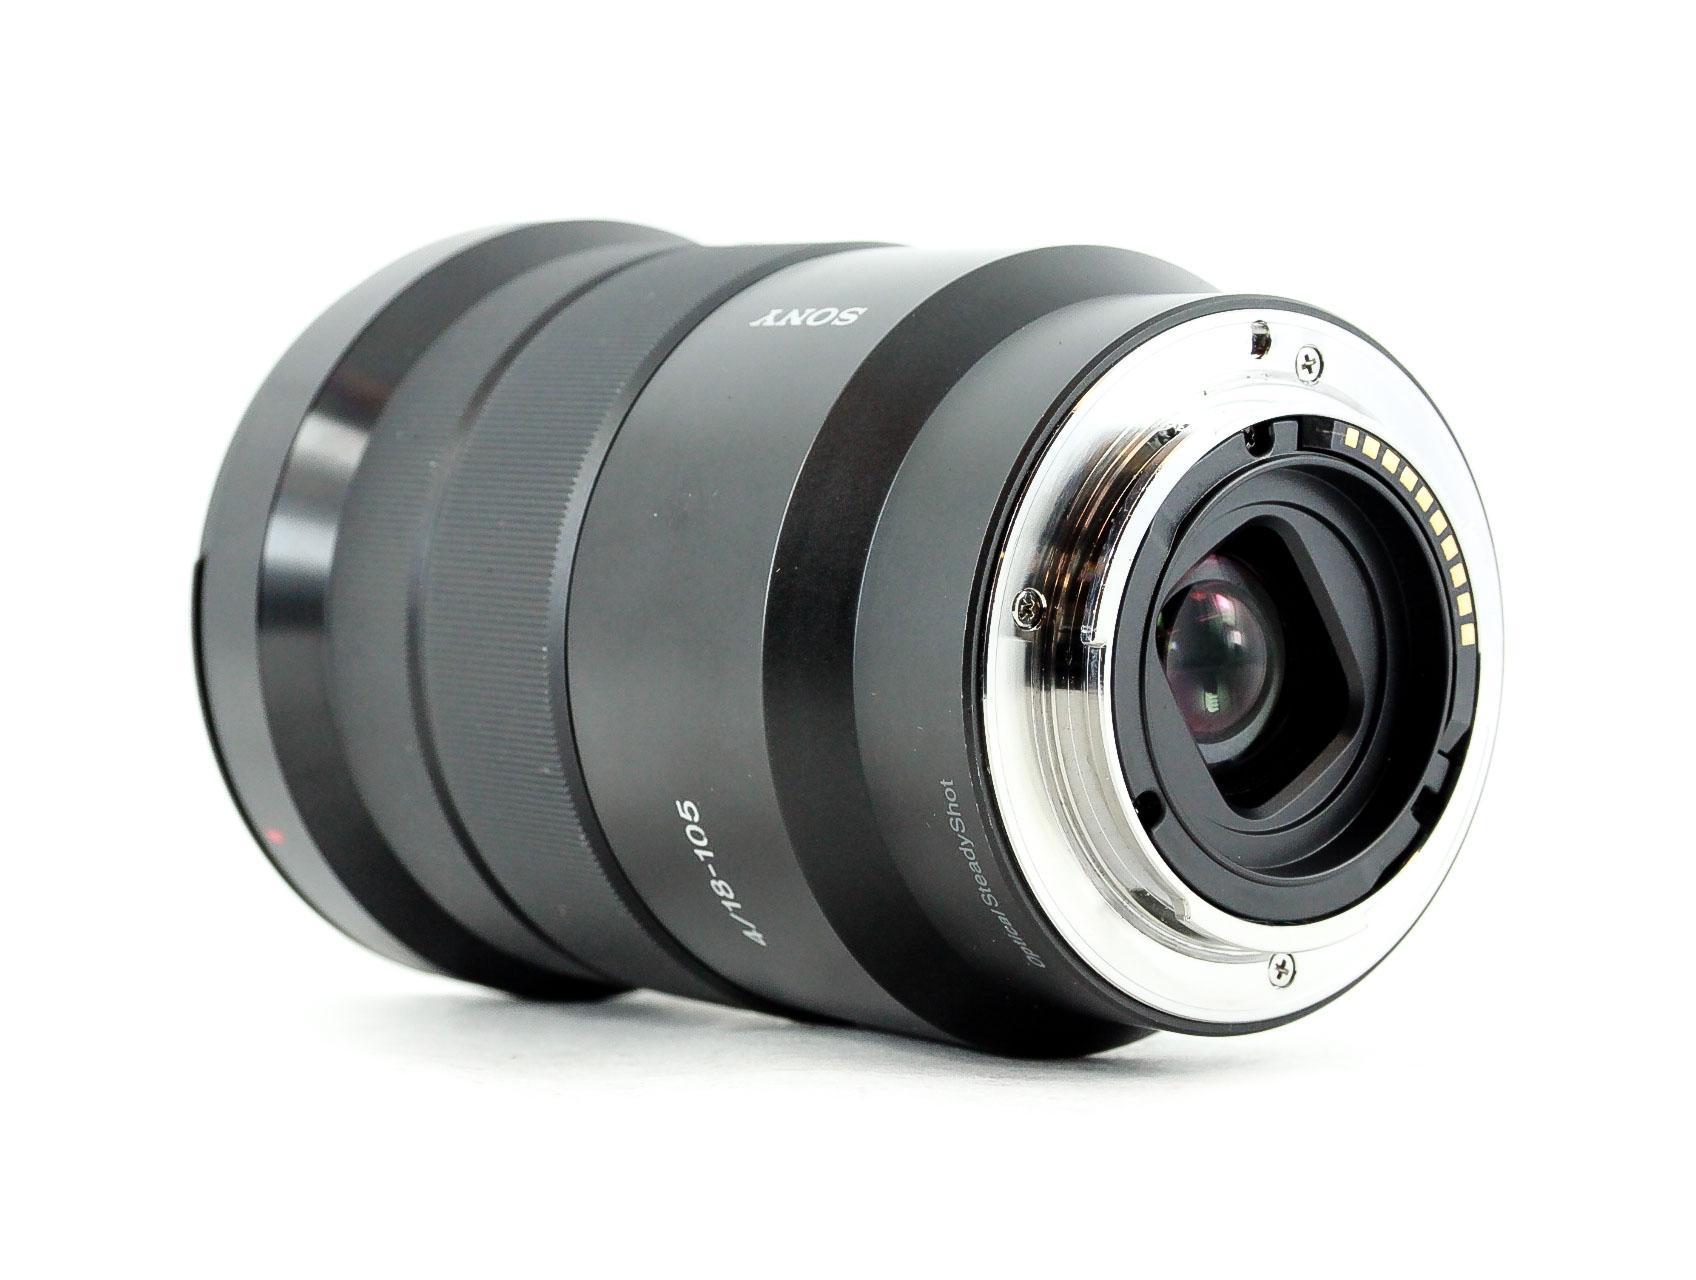 Sony E 18-105mm f4 SELP18105G: Sony E PZ 18-105mm f/4 G